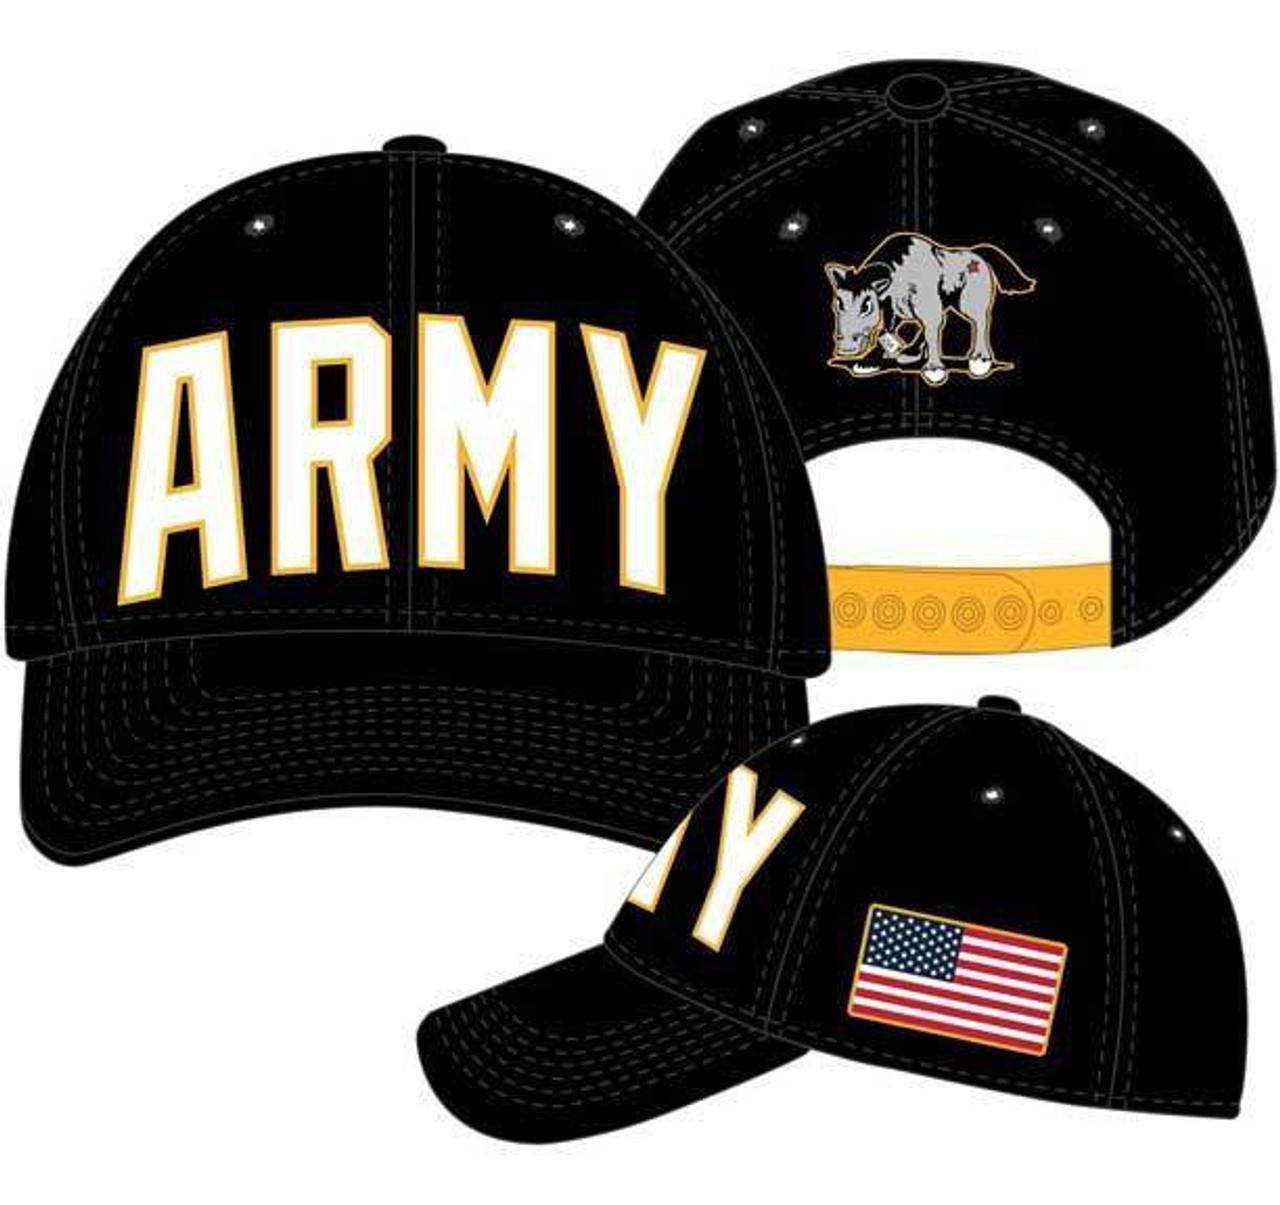 260666b6bab United States USA Army American Flag Adjustable Snapback Cap Hat  BA02292ARMM - Fearless Apparel